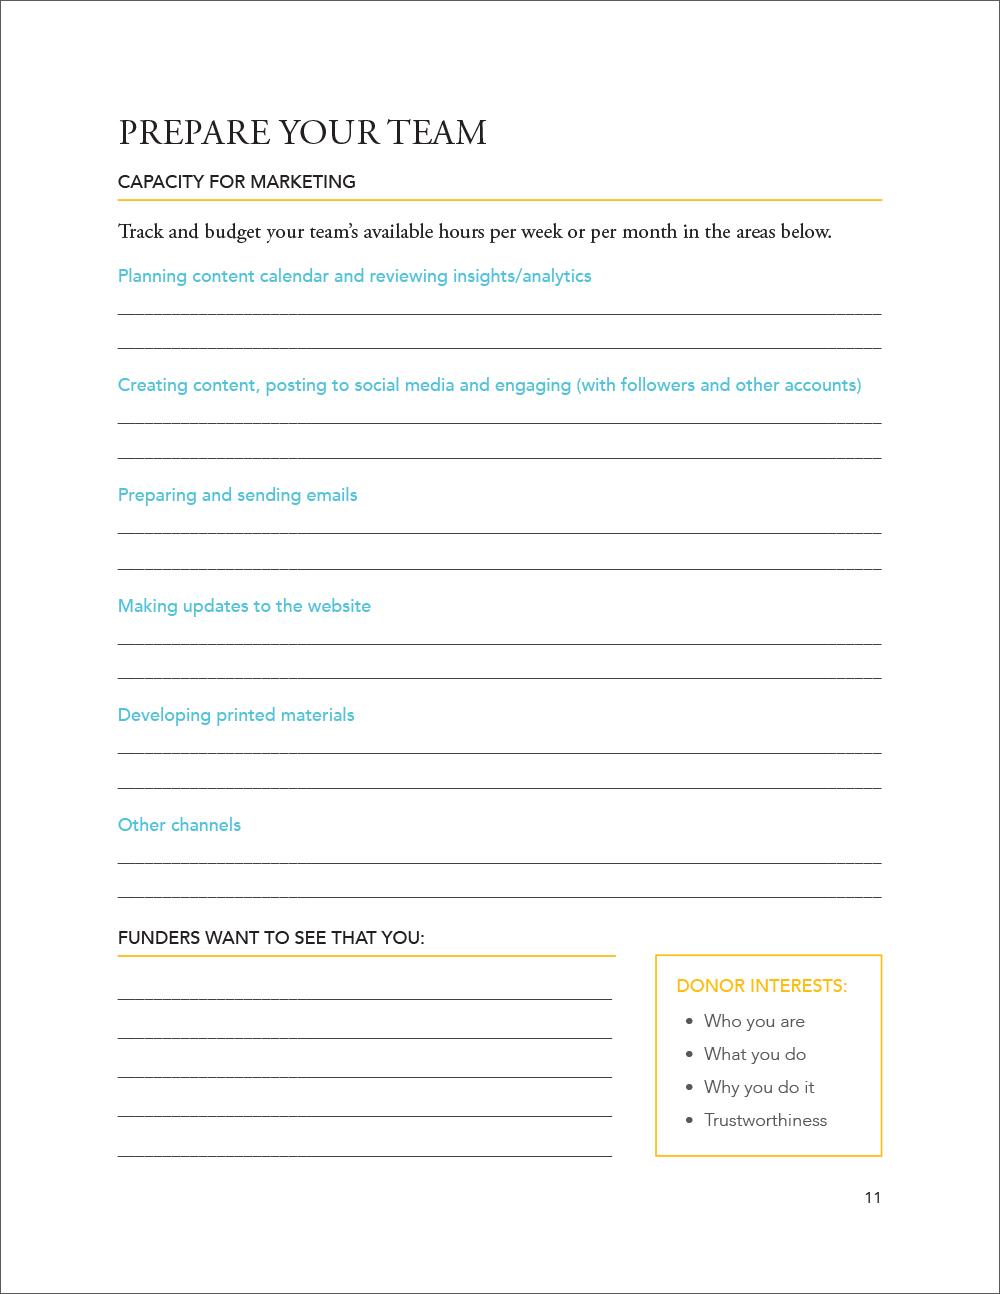 MNA-GuideToTheGalaxy-Workbook-11.jpg